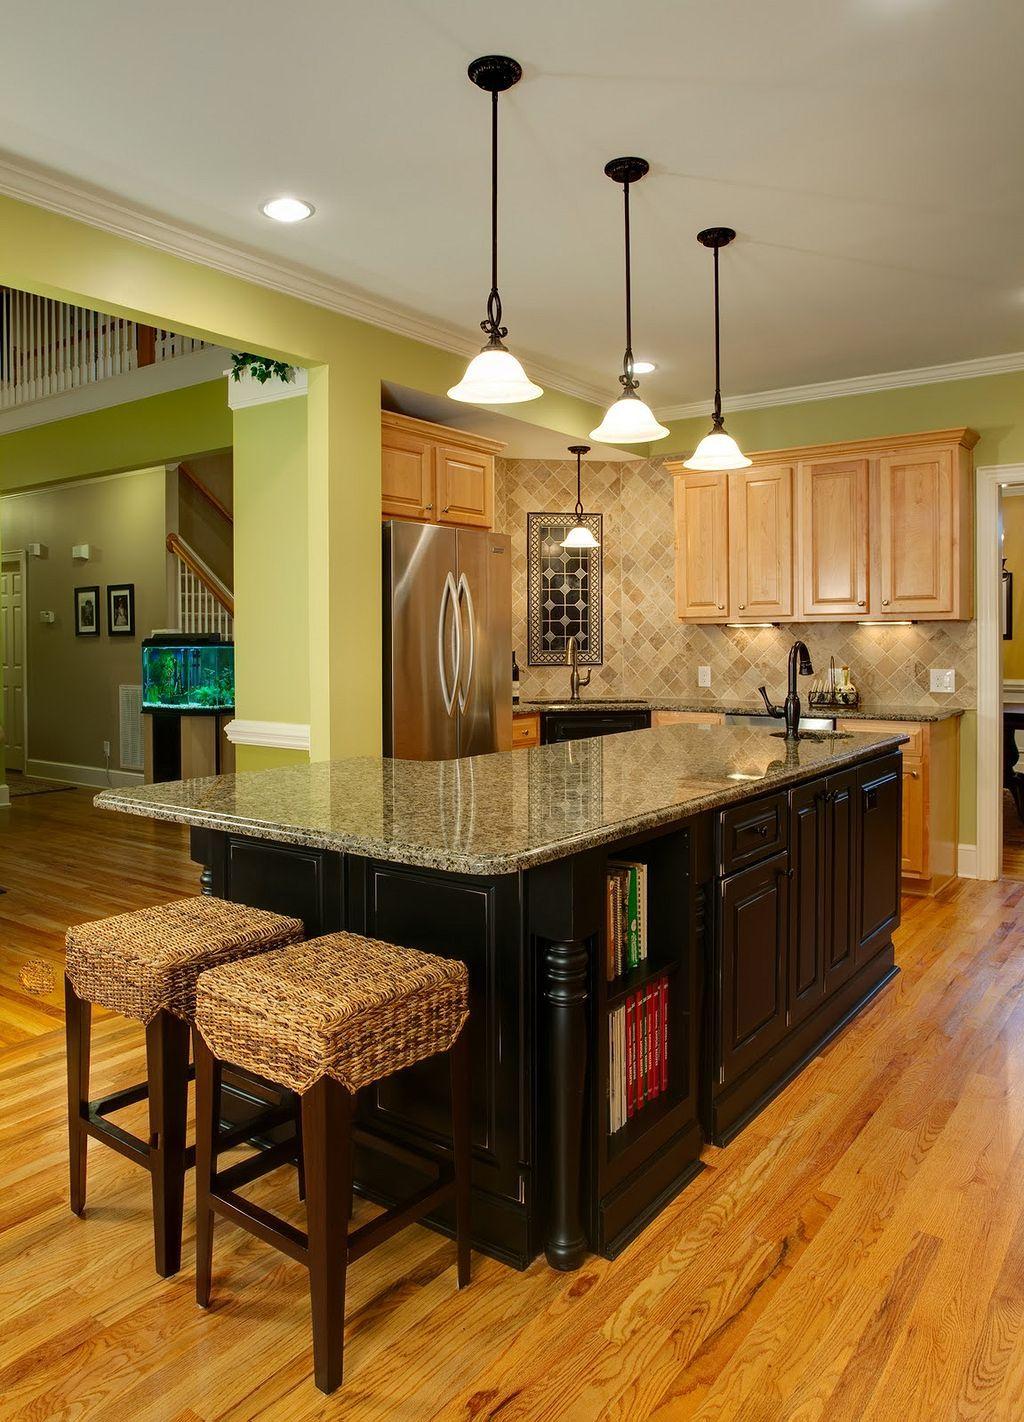 deluxe custom kitchen island designs 17 custom kitchen island kitchen island design l on l kitchen remodel id=94187